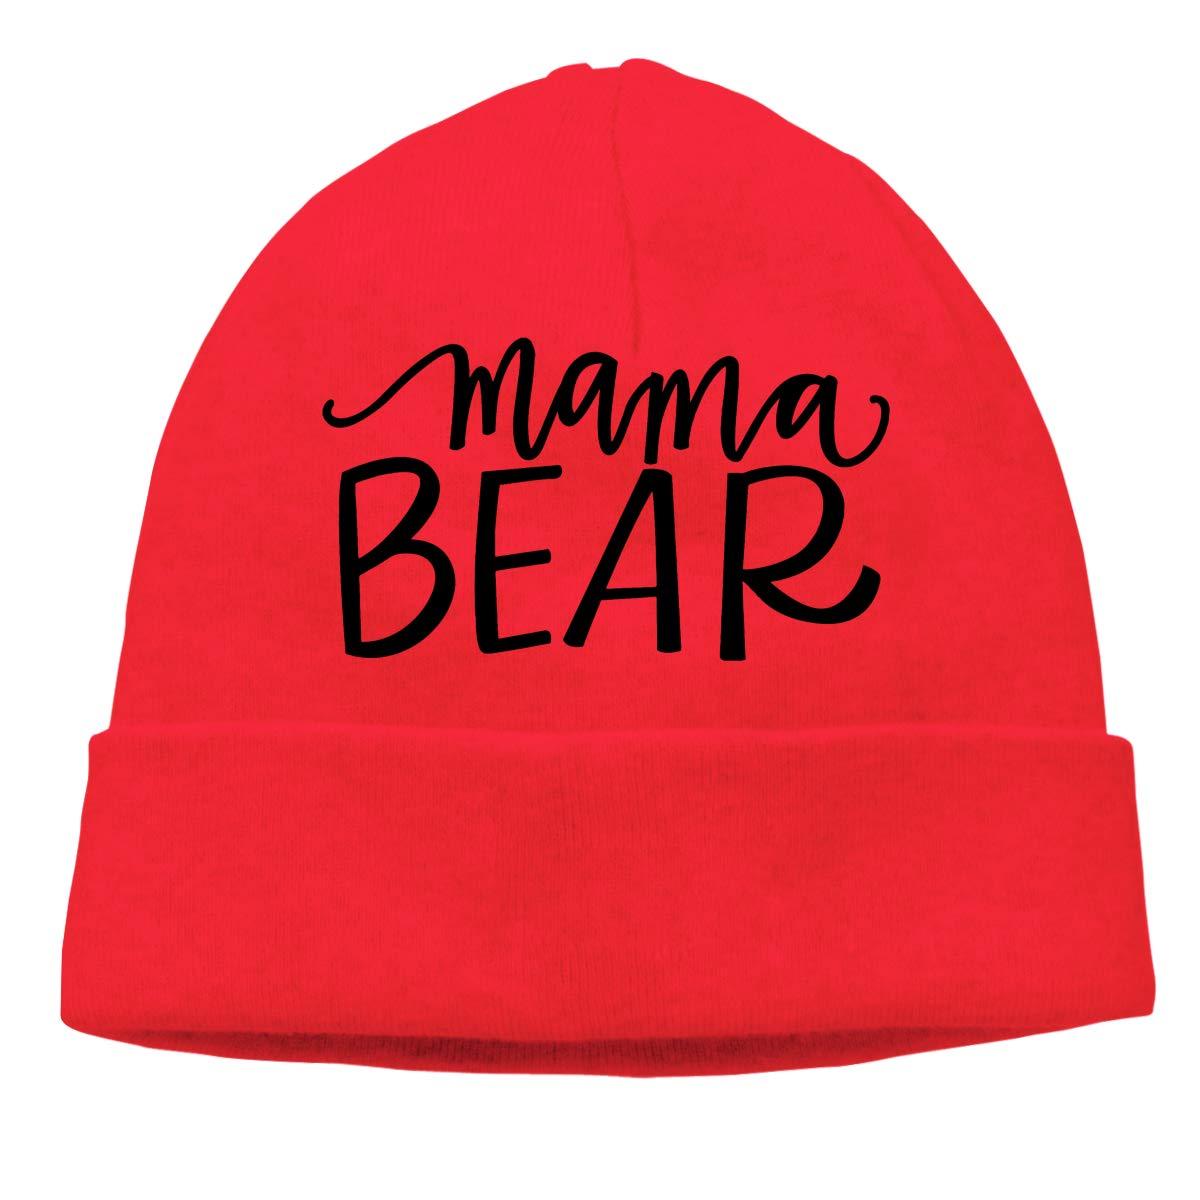 Mama Bear 1 Warm Stretchy Solid Daily Skull Cap,Knit Wool Beanie Hat Black